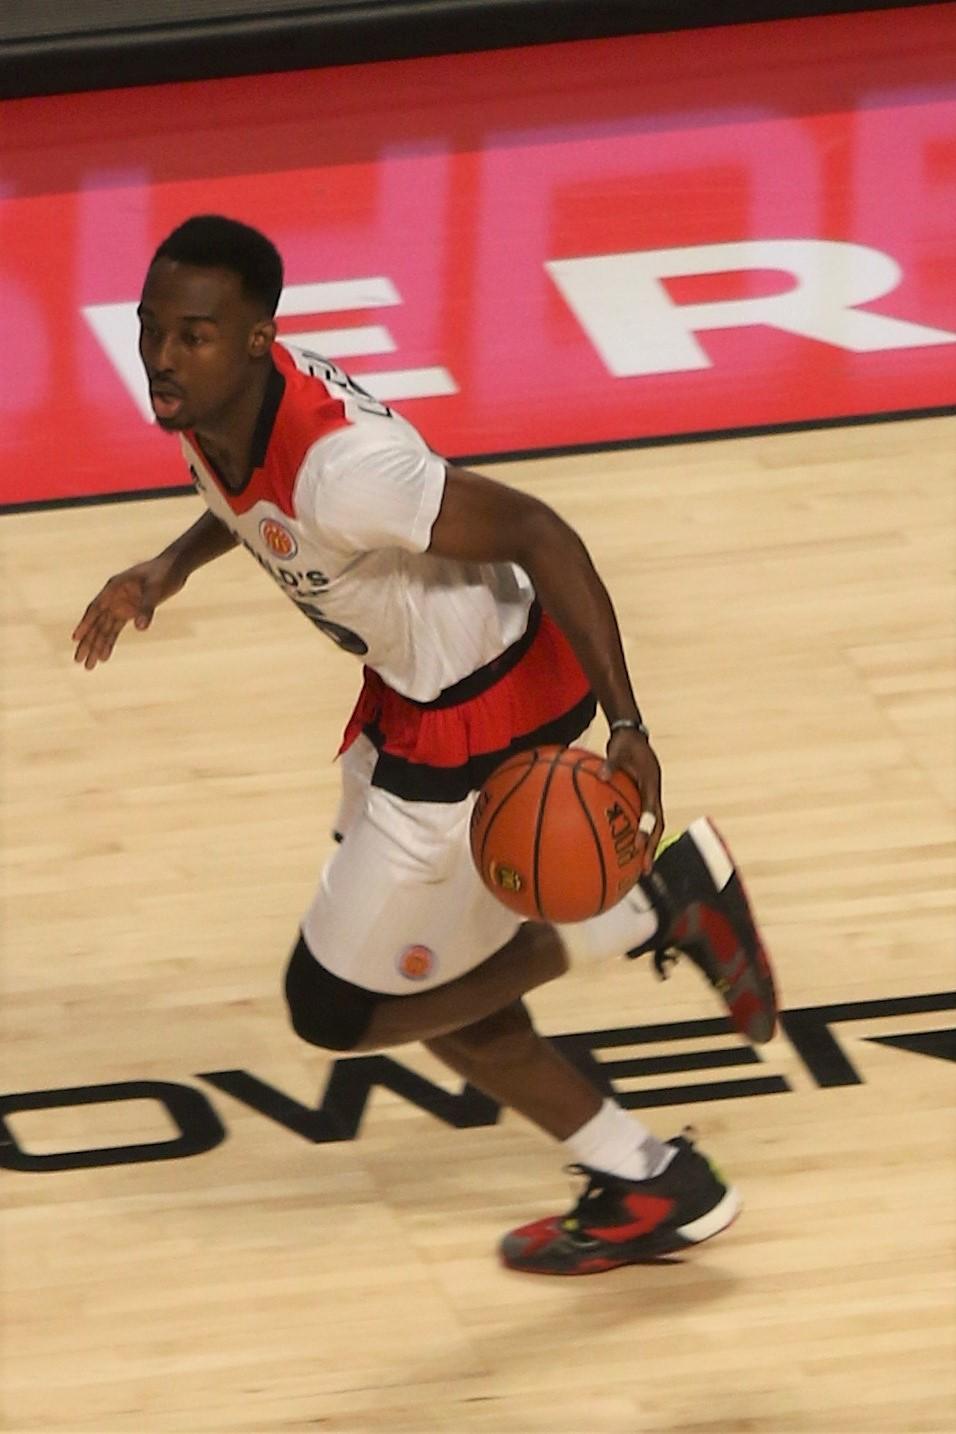 2016–17 Big Ten Conference men's basketball season - Wikipedia